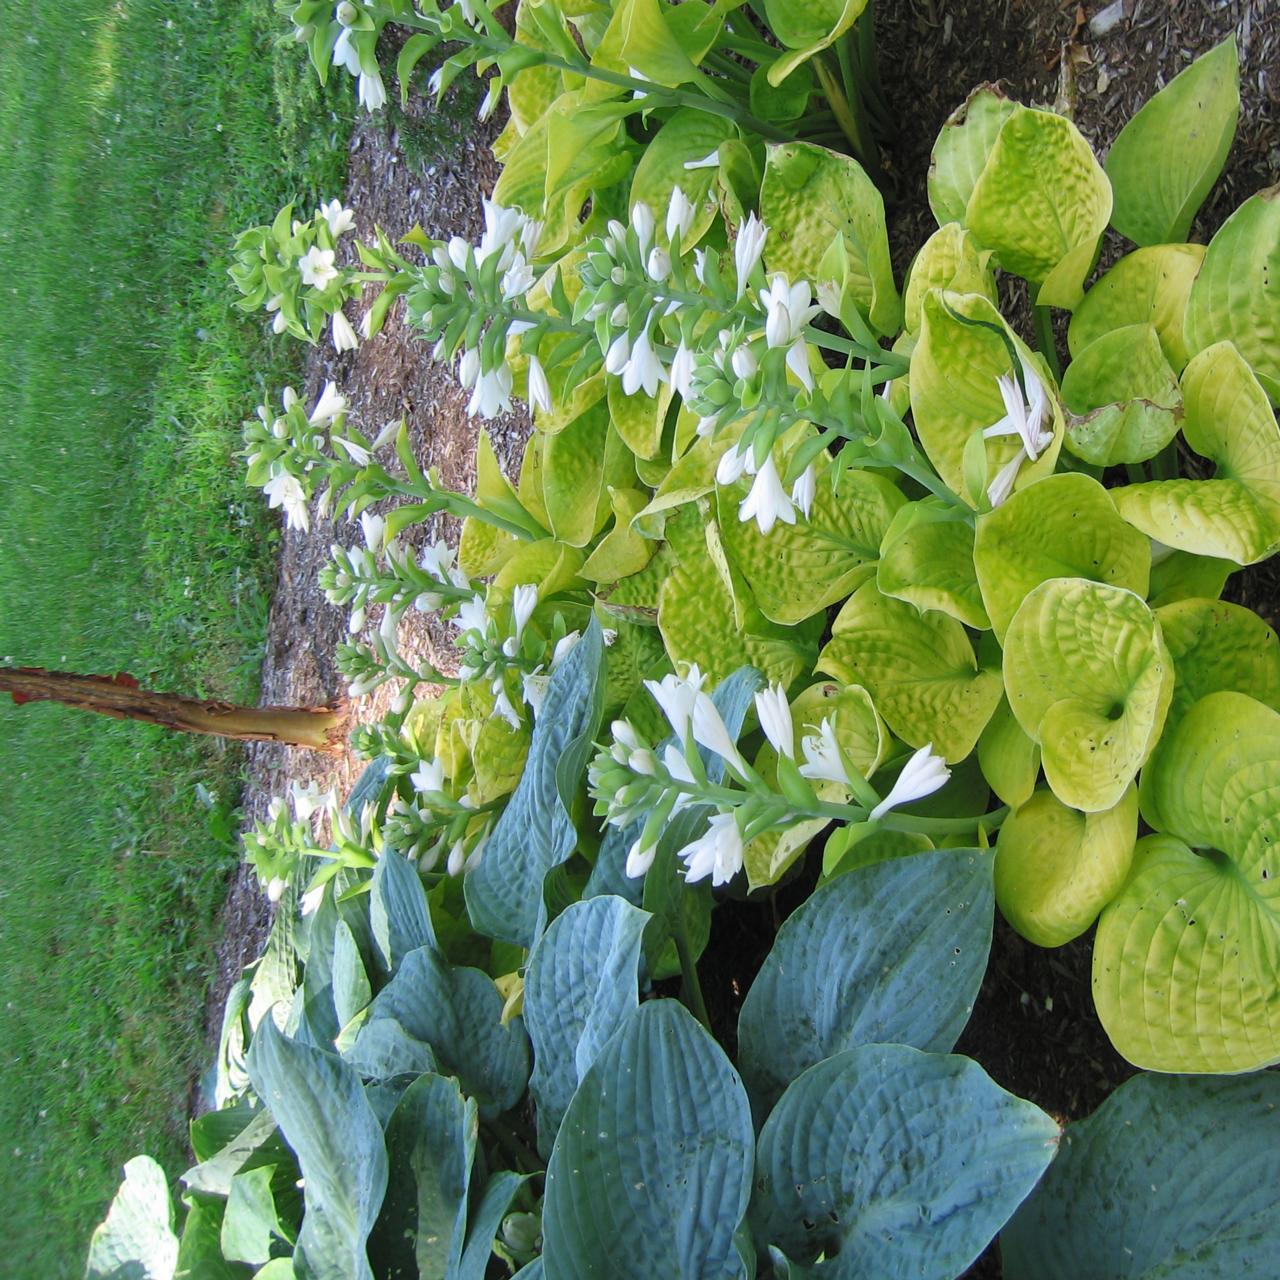 Hosta 'Maui Buttercups' plant